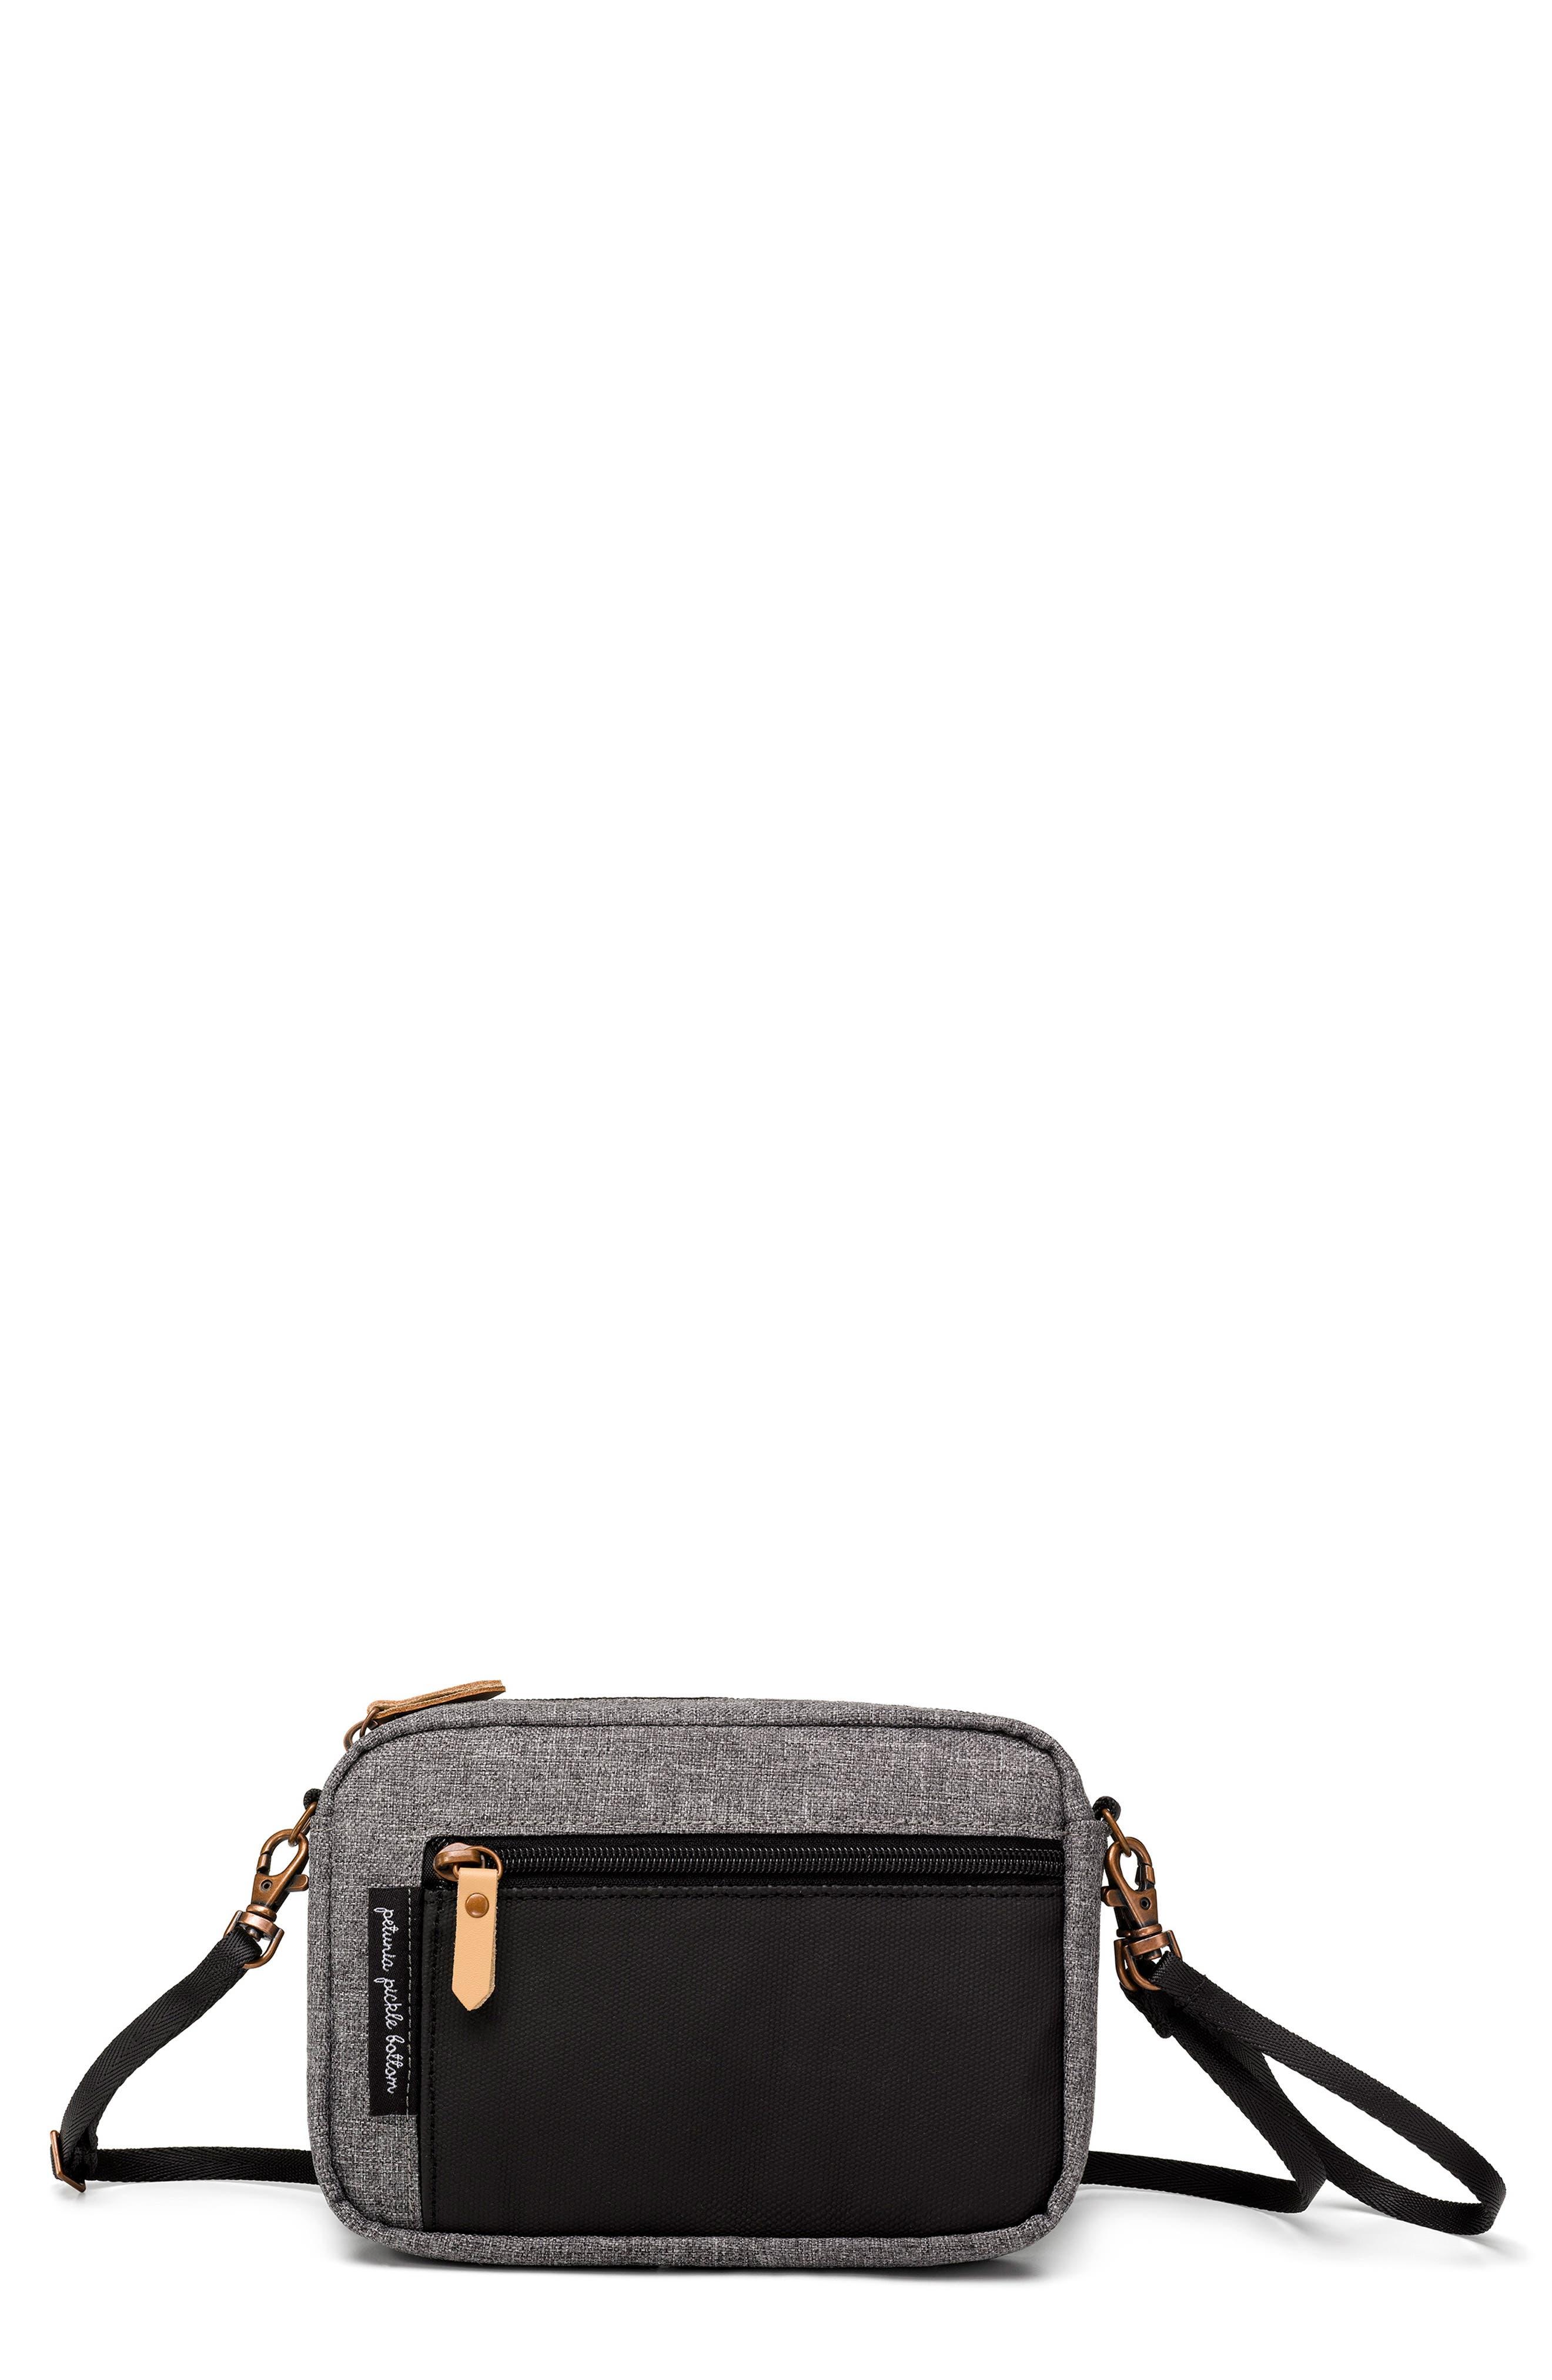 Adventurer Belt Bag,                             Main thumbnail 1, color,                             GRAPHITE/ BLACK